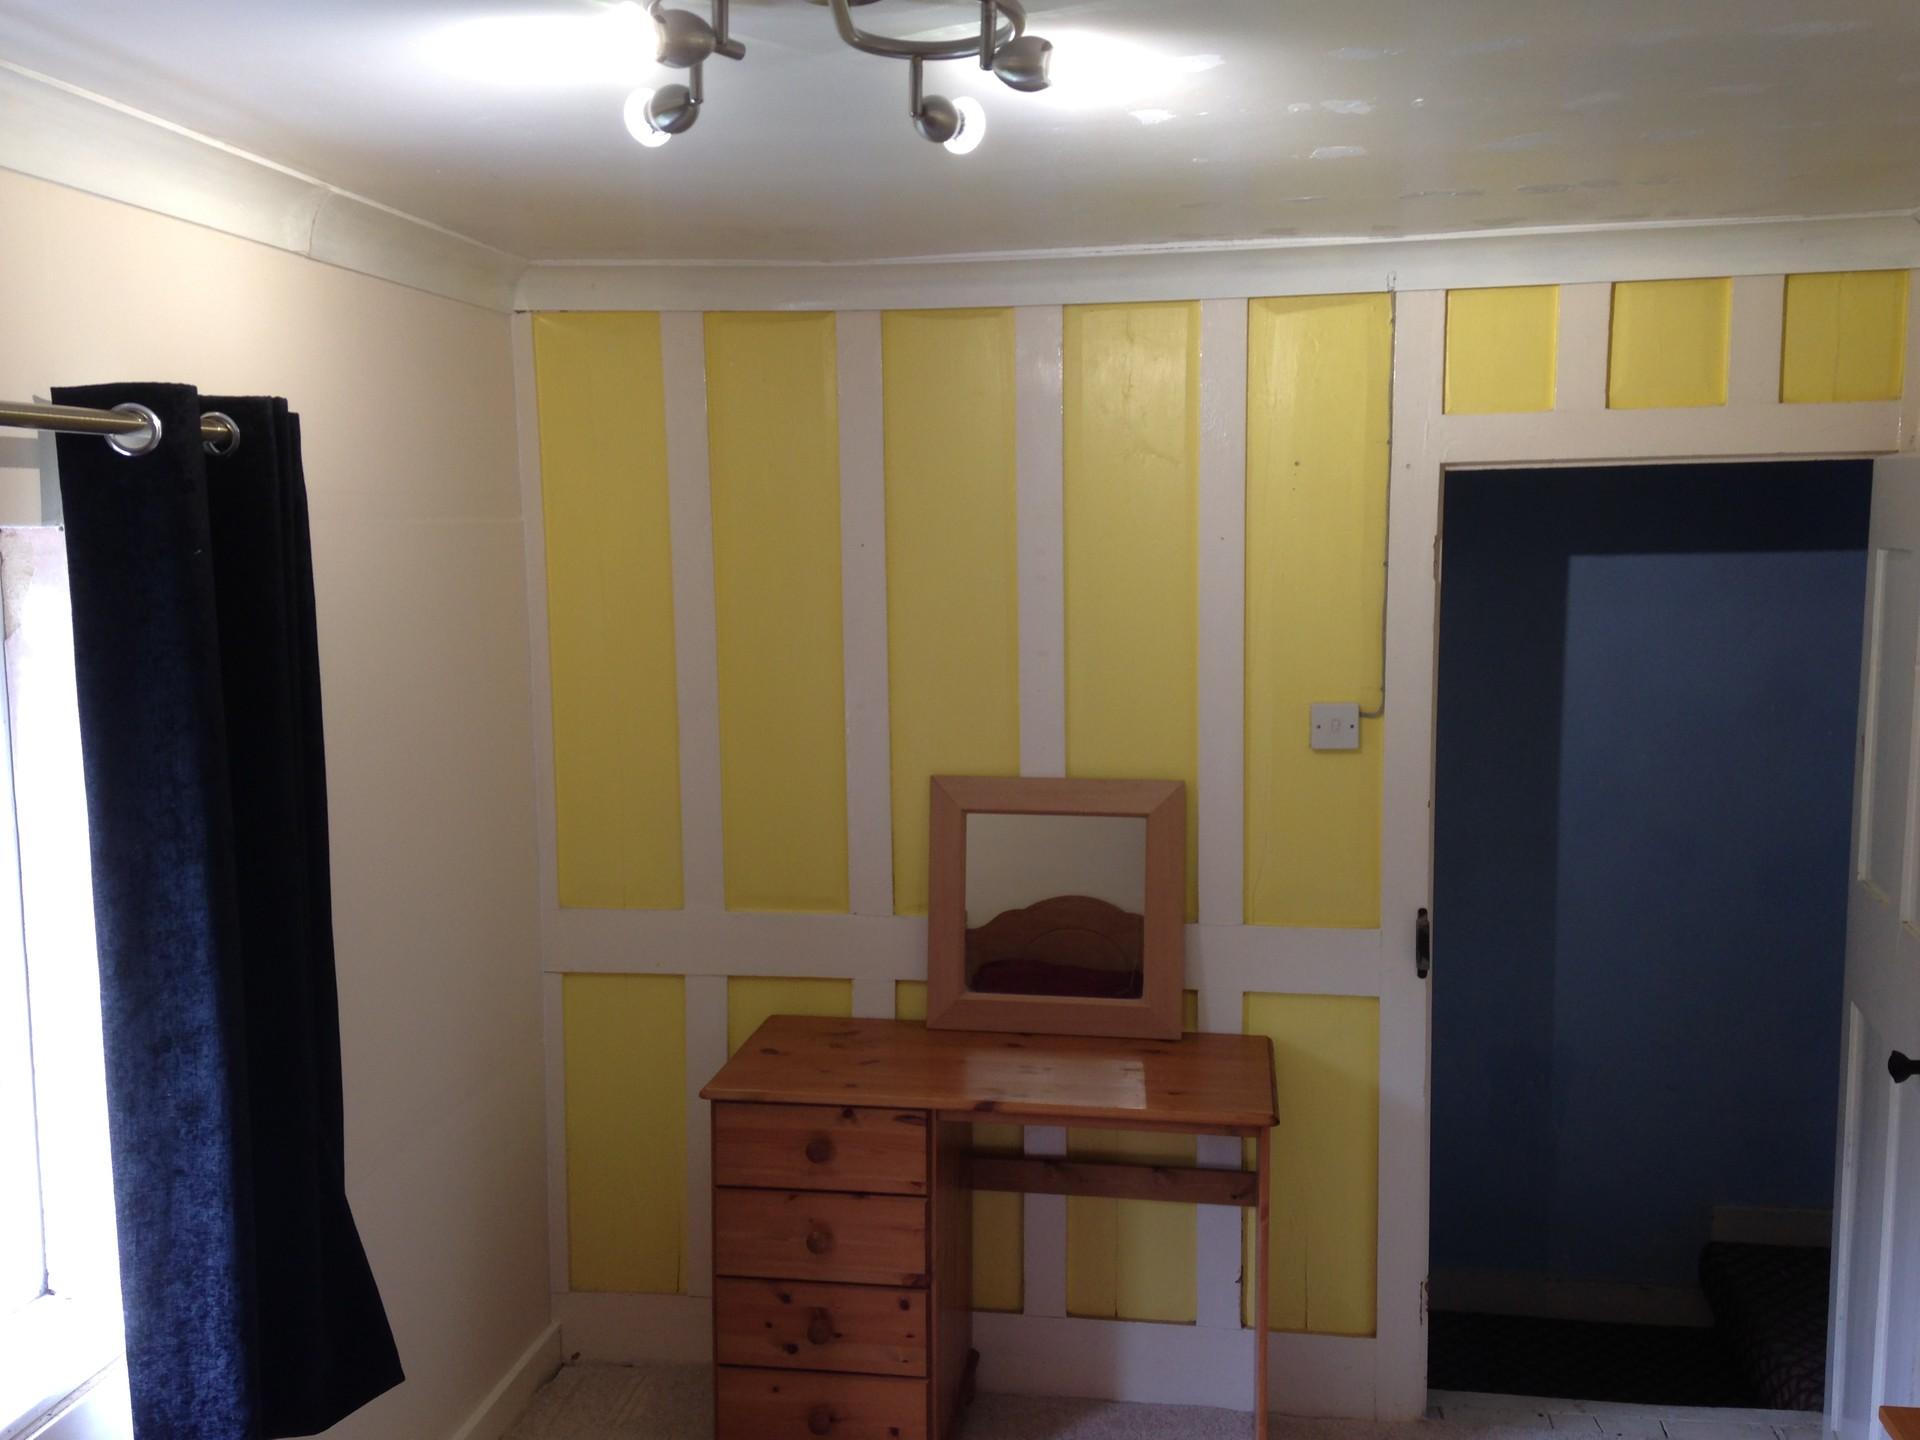 room-let-bedroom-house-9ee43b0b69e6ac041